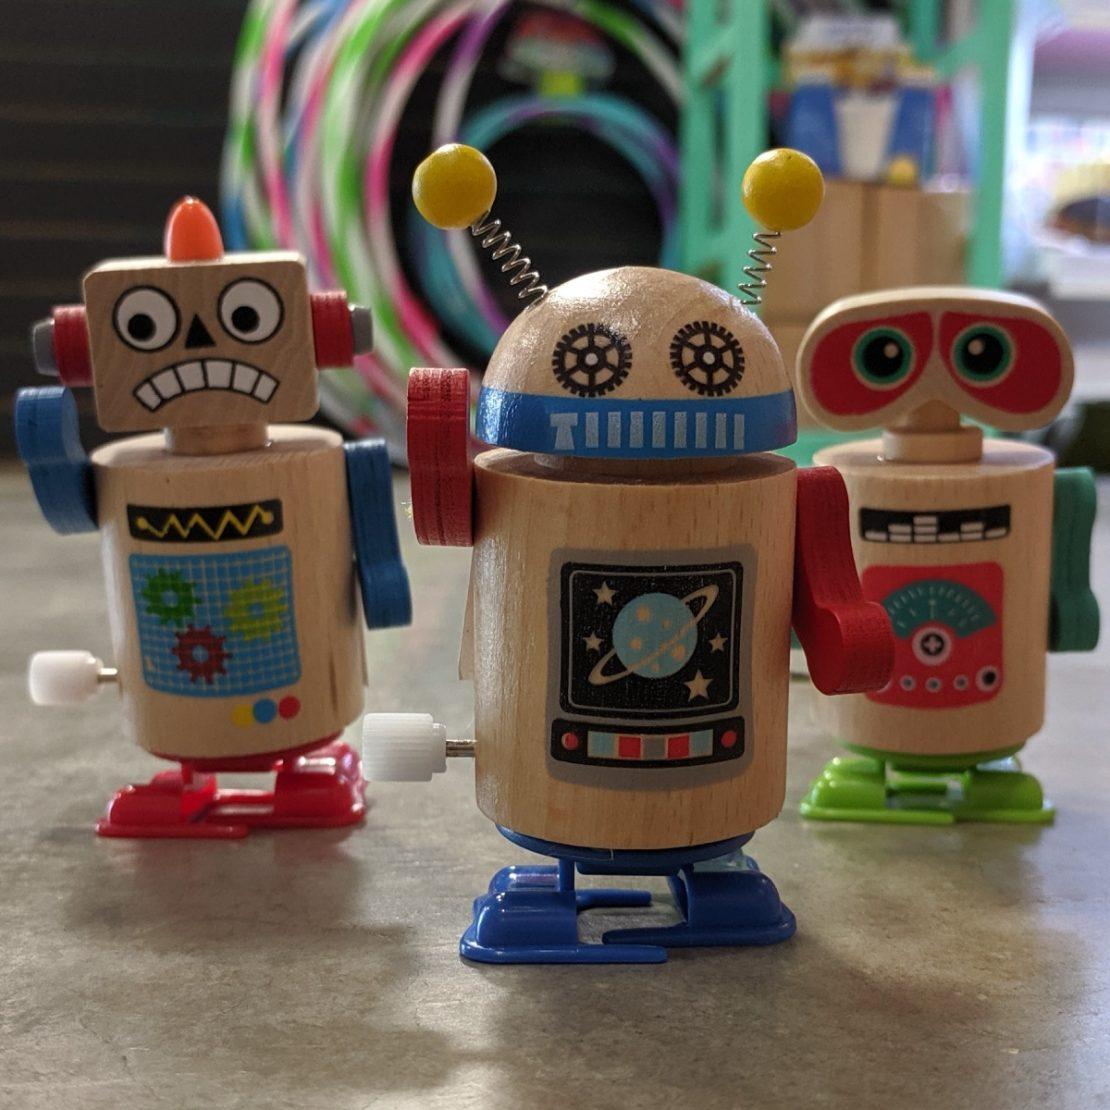 Wooden Robot Dance Party Wind-Ups